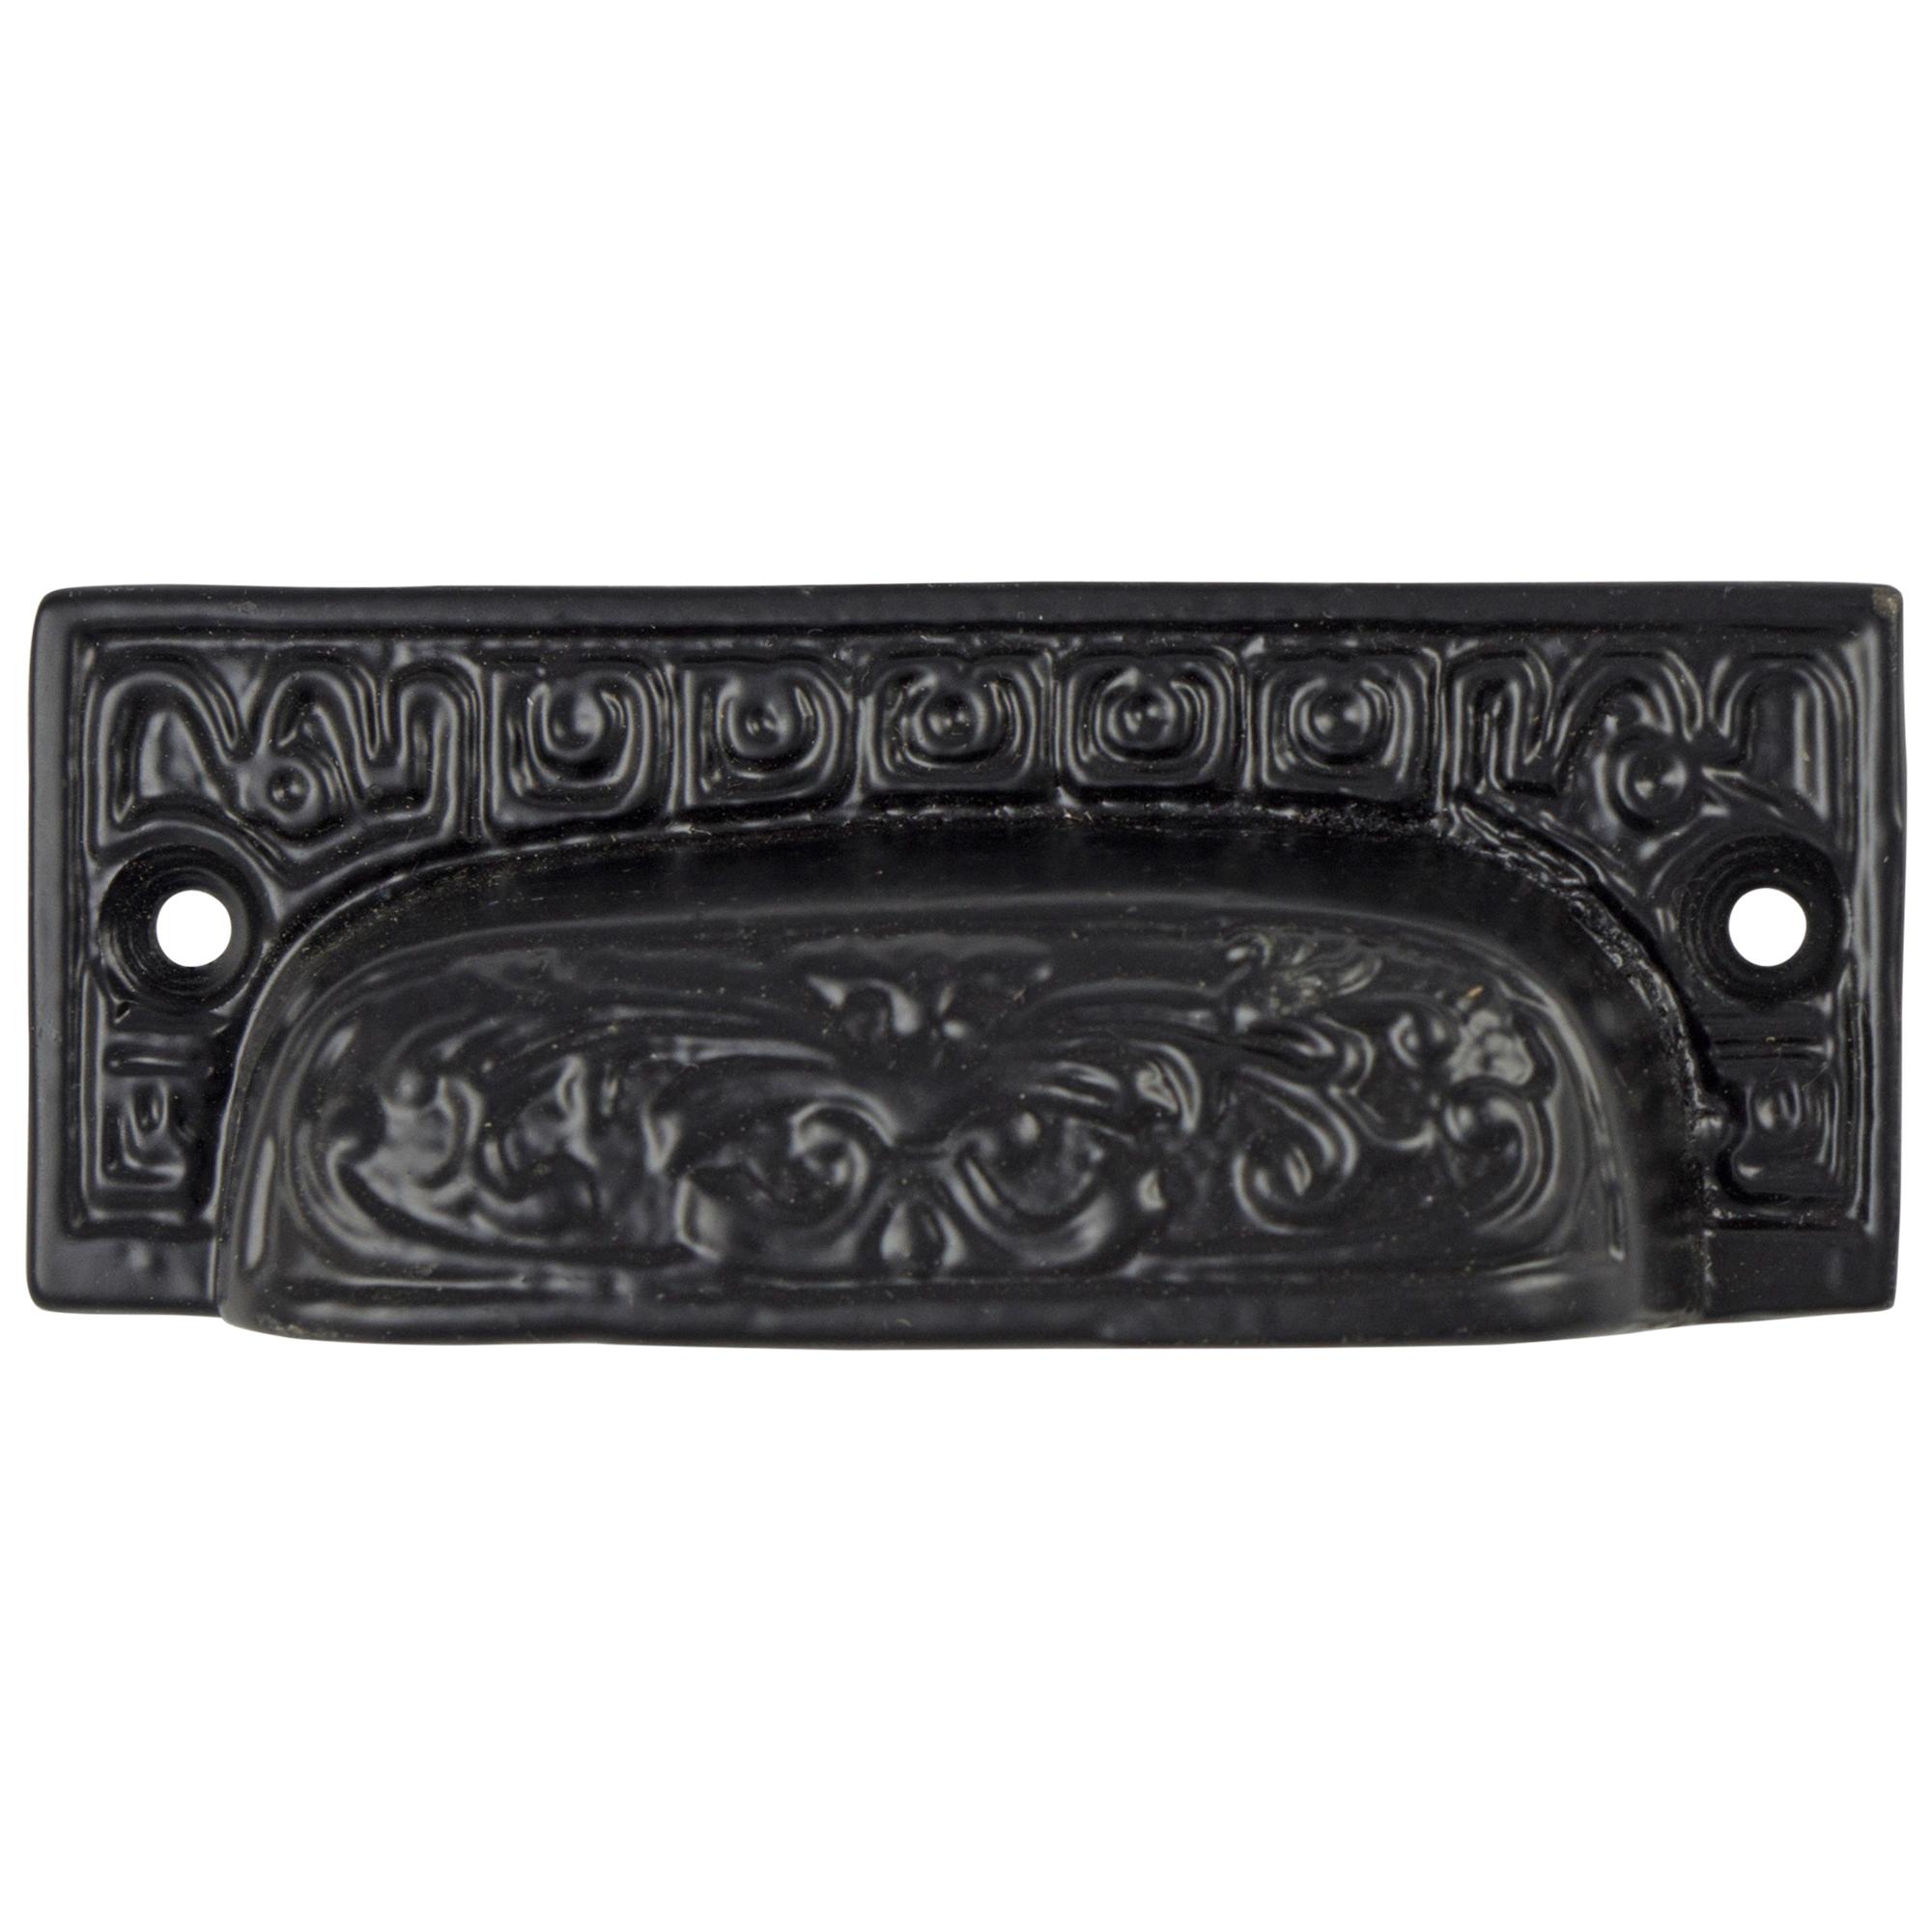 Old Aged Cast Iron BIN PULL Vintage Restoration Hardware